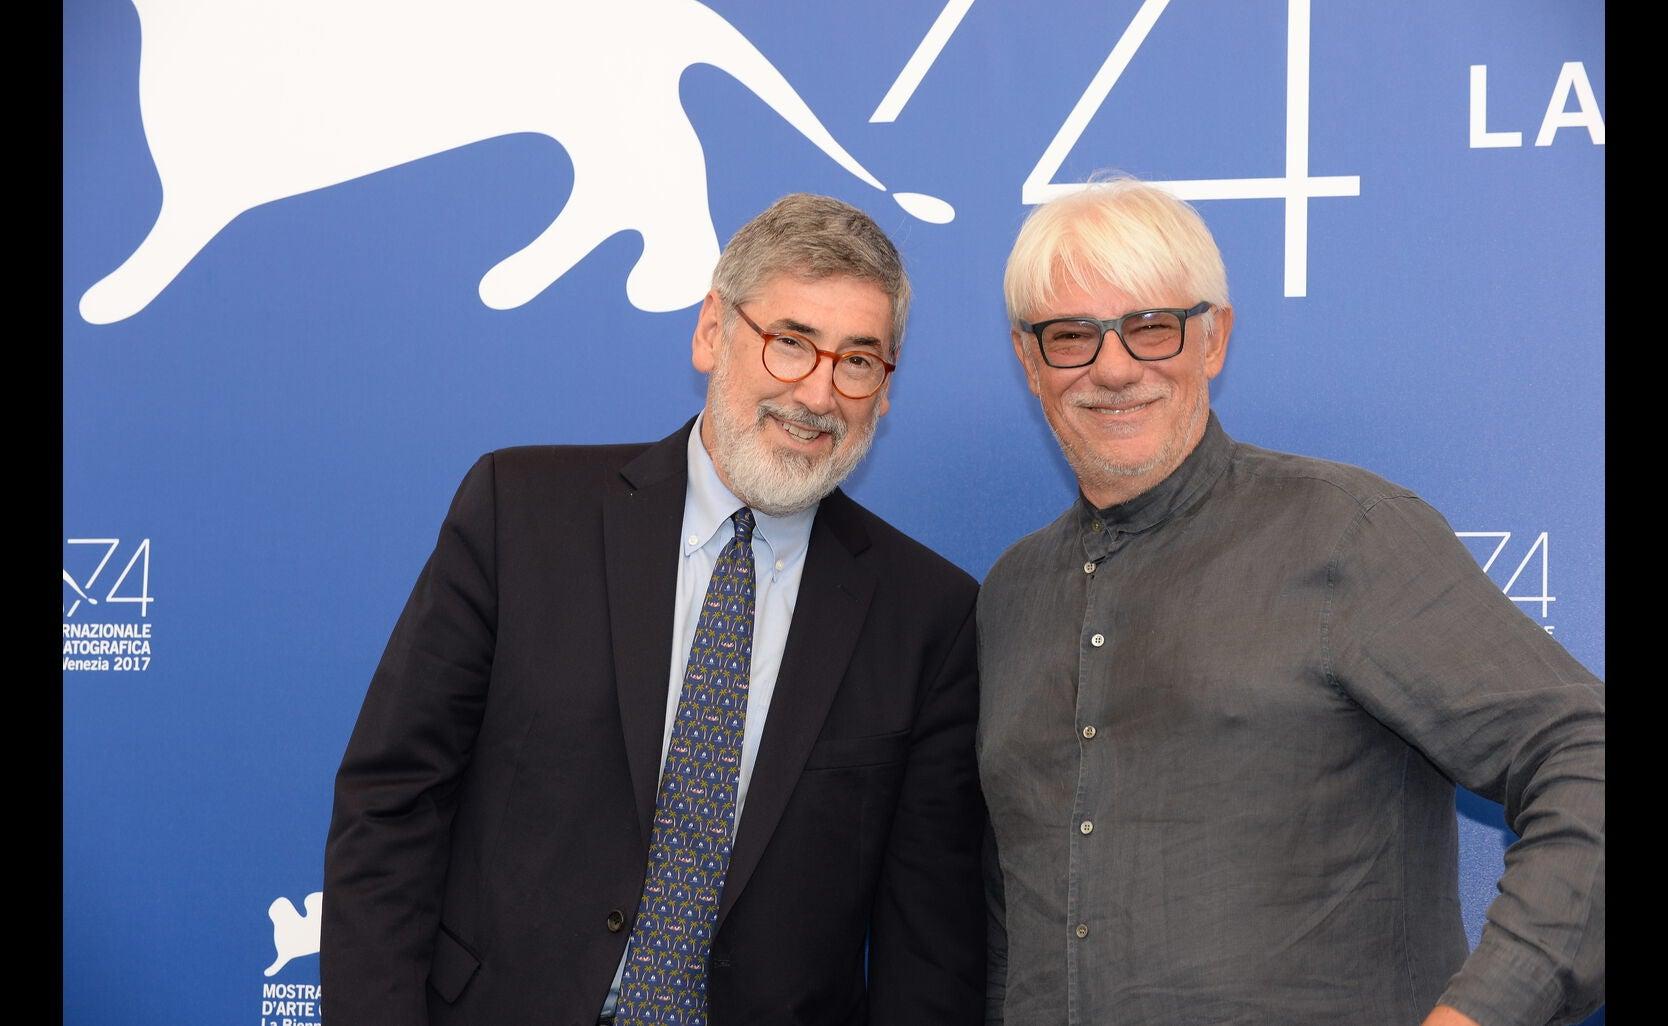 Directors John Landis and Ricky Tognazzi, jury memebr at the 2017 Venice Film Festival